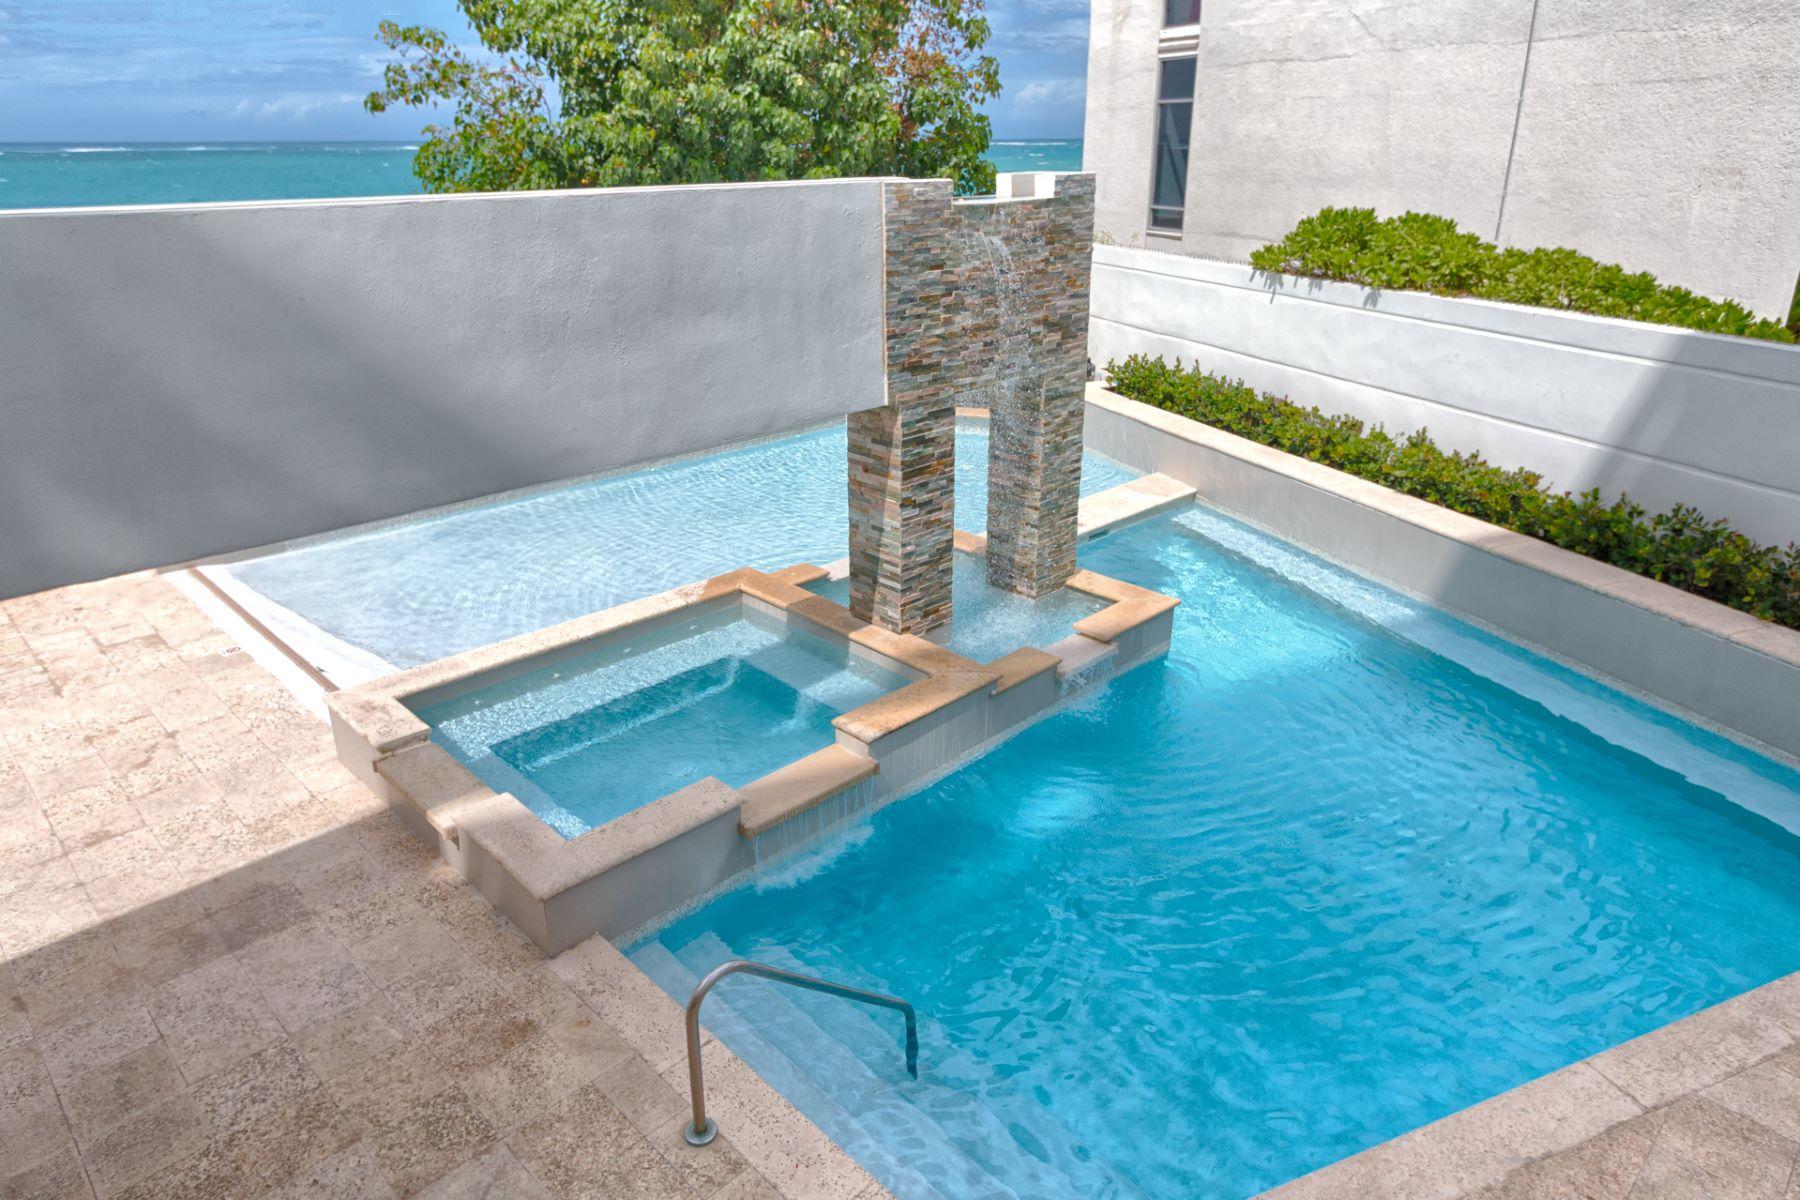 Additional photo for property listing at Oceanfront at Aquamarina 1315 Ashford Avenue San Juan, Puerto Rico 00907 Porto Rico